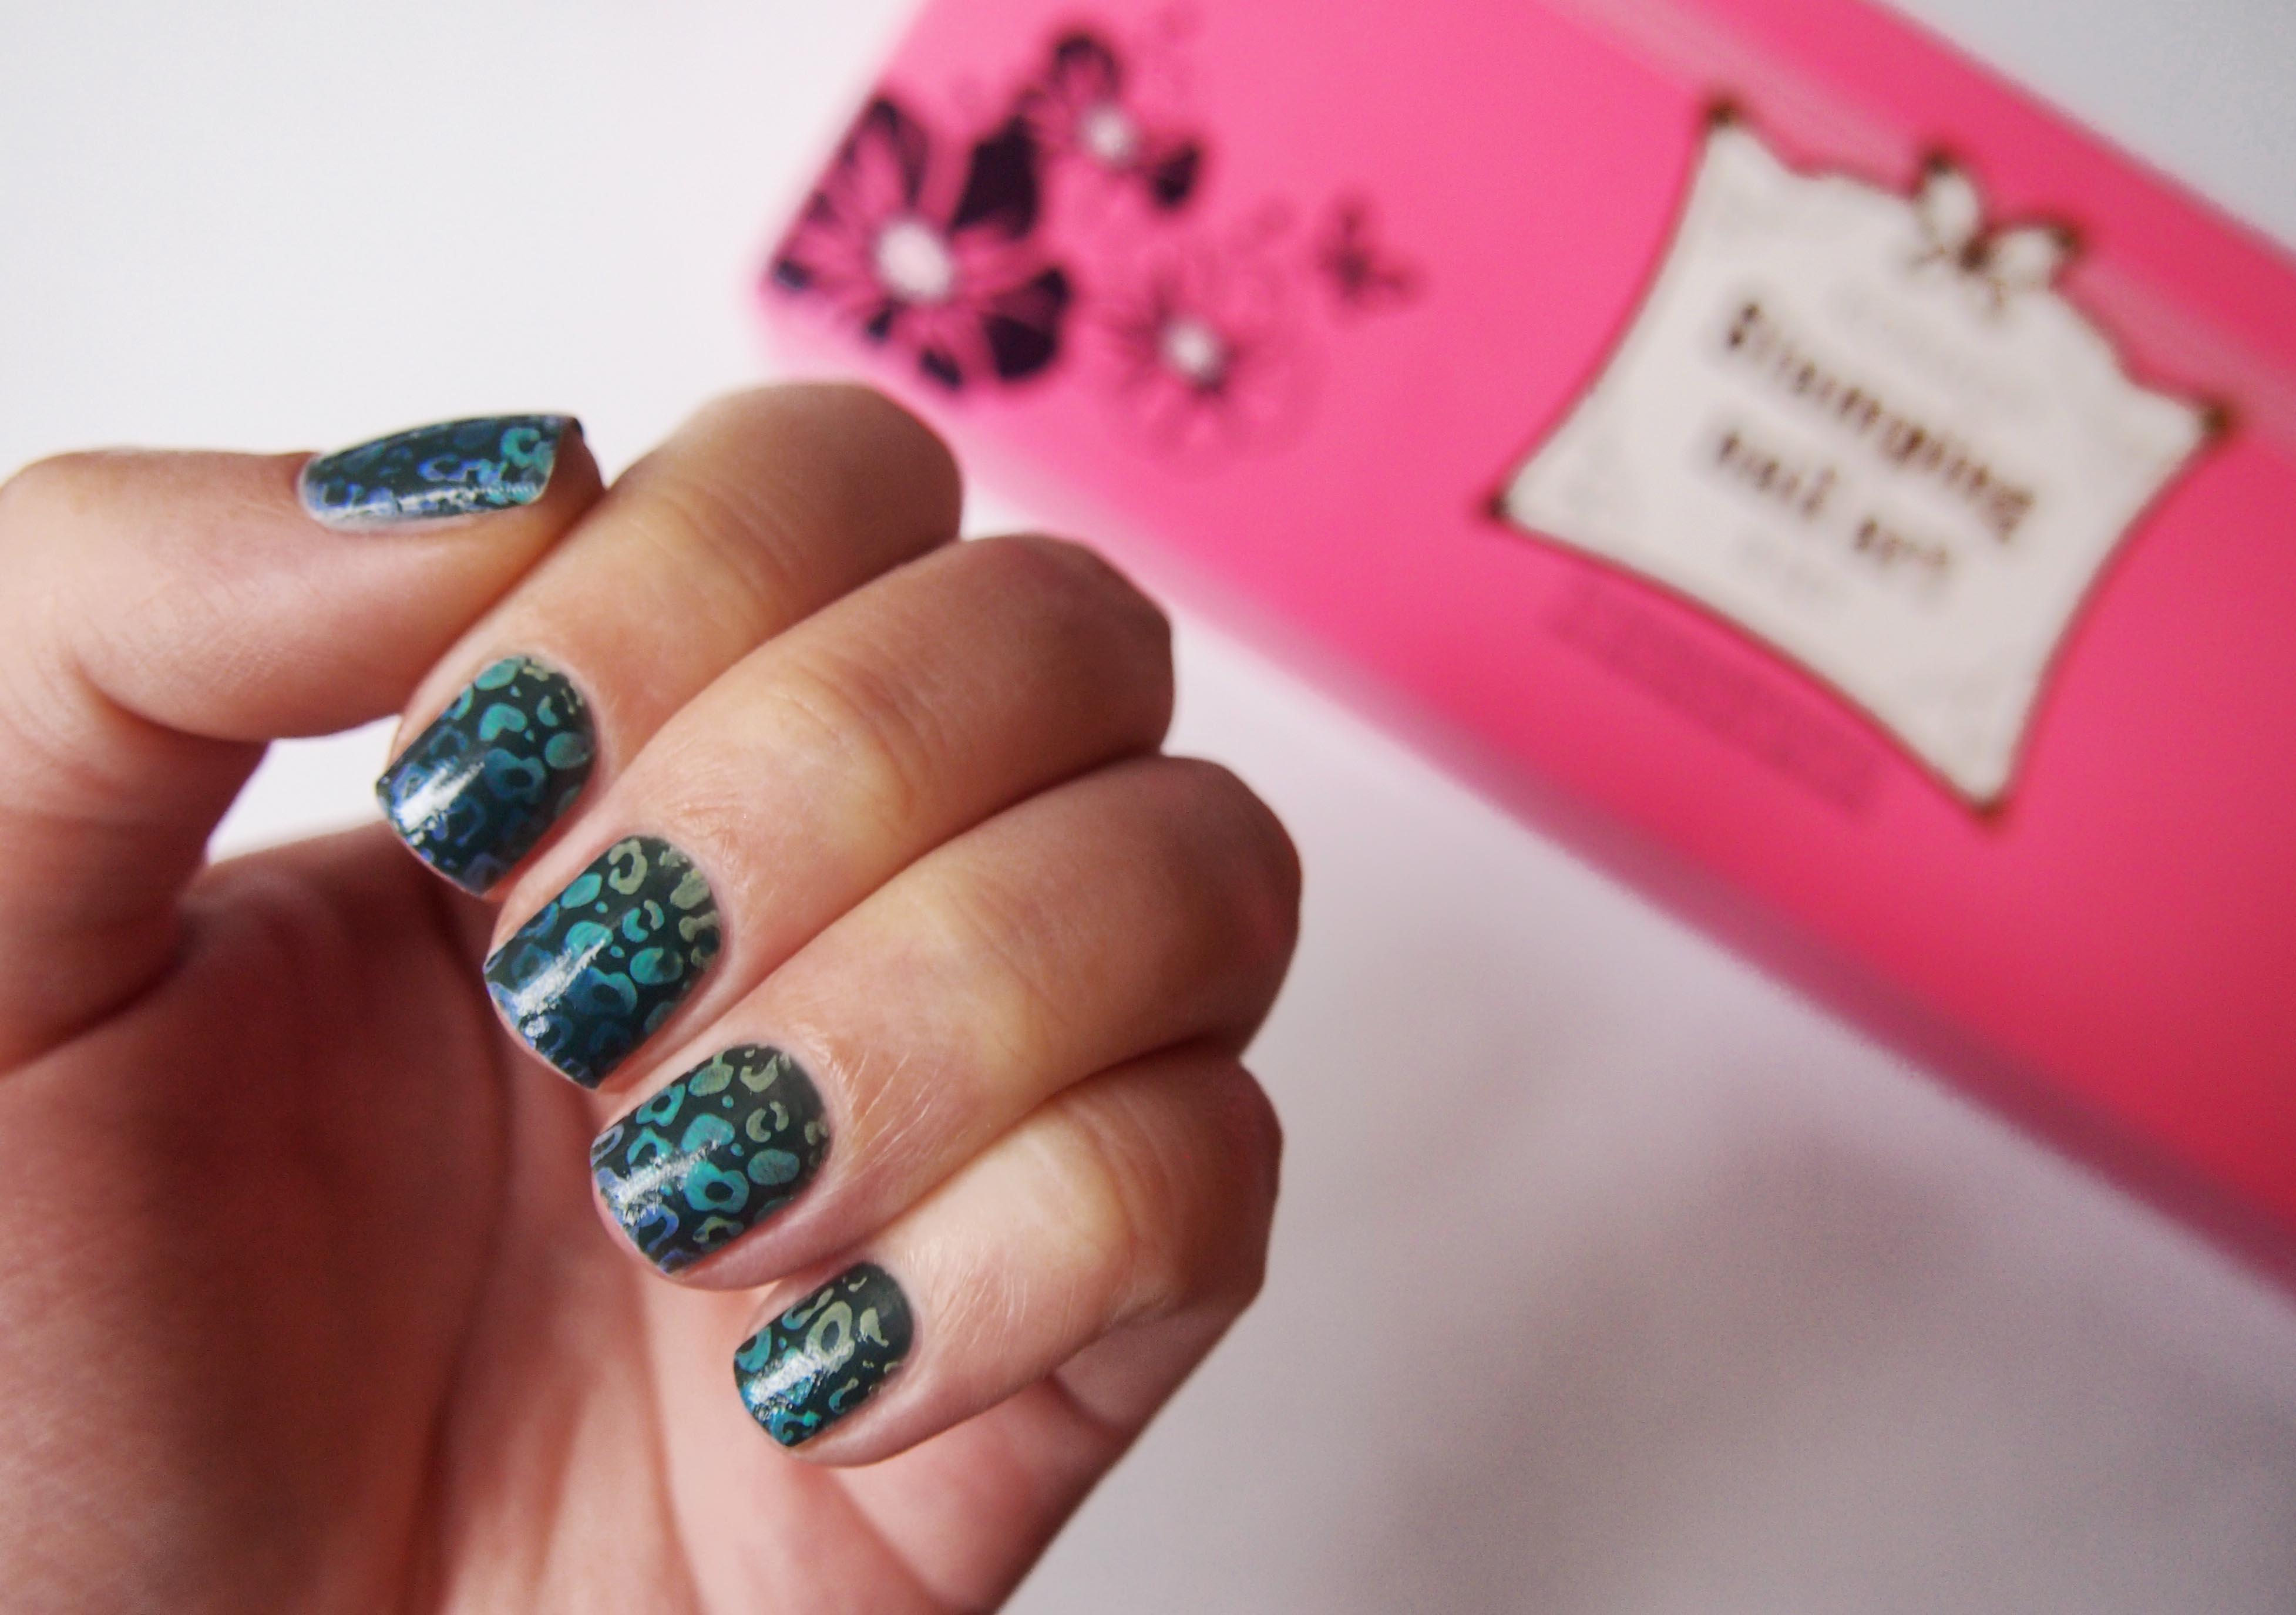 ... Konad Stamping Nail Art Kit». | Записки лакоголика